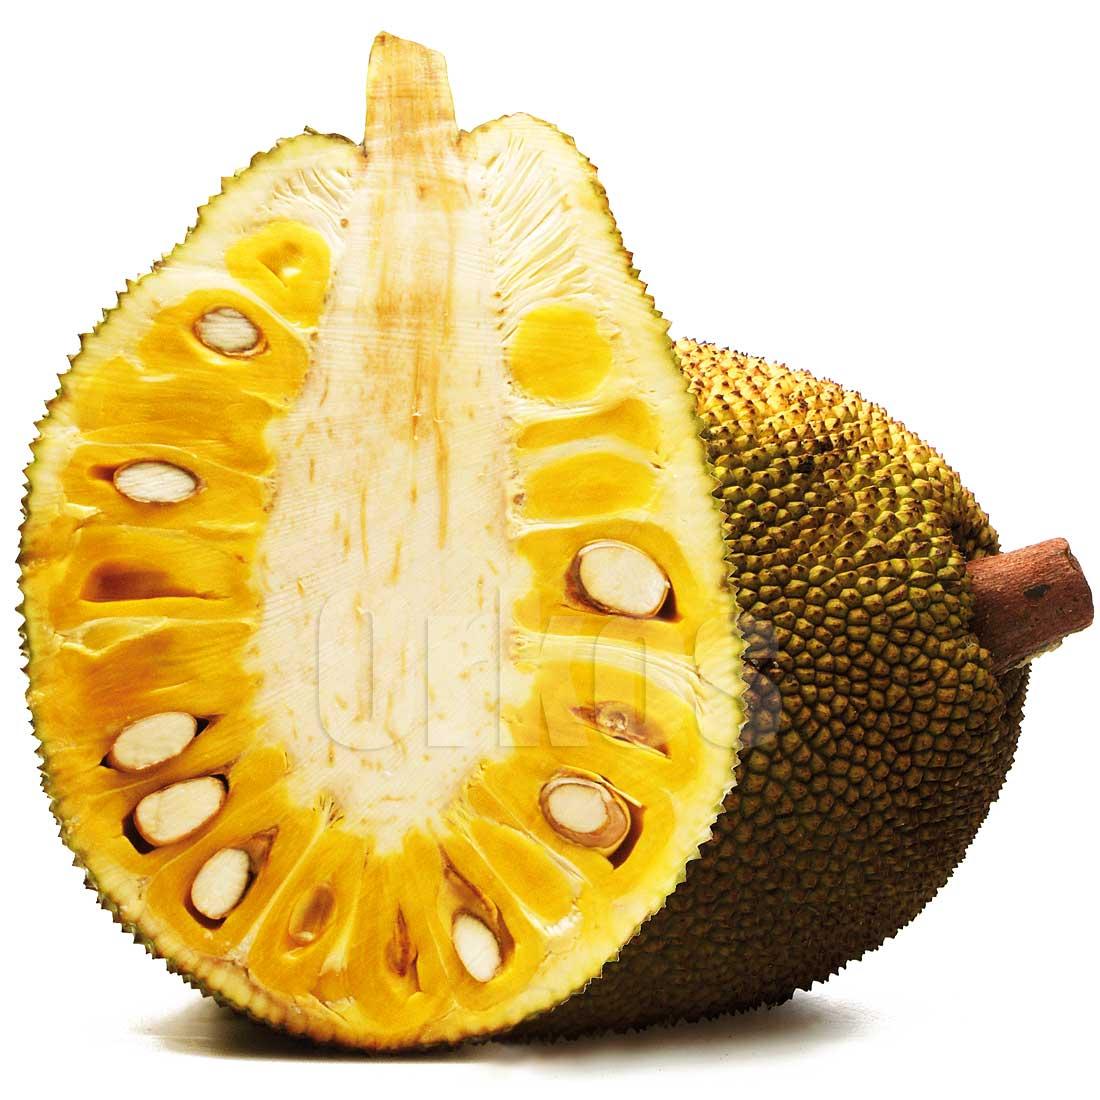 PNG Jackfruit - 70074